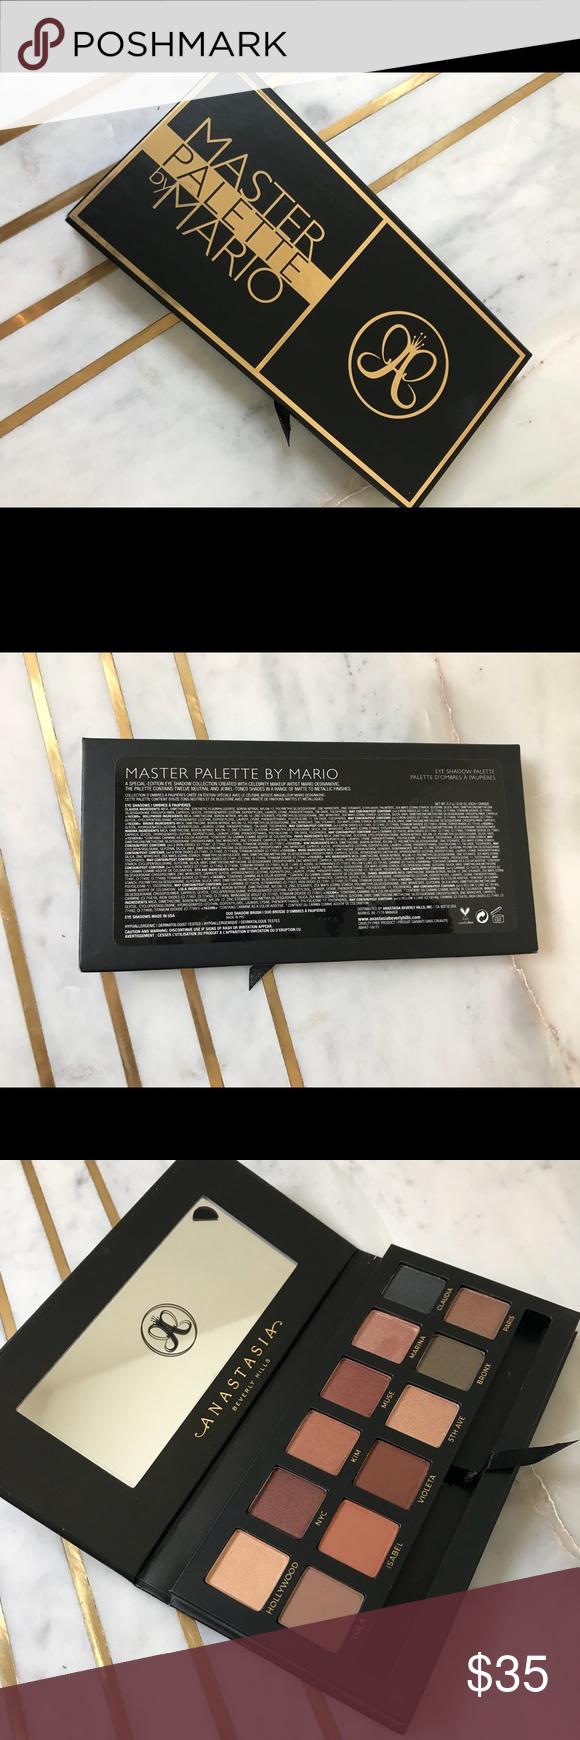 Anastasia Beverly Hills Makeup Haul - YouTube